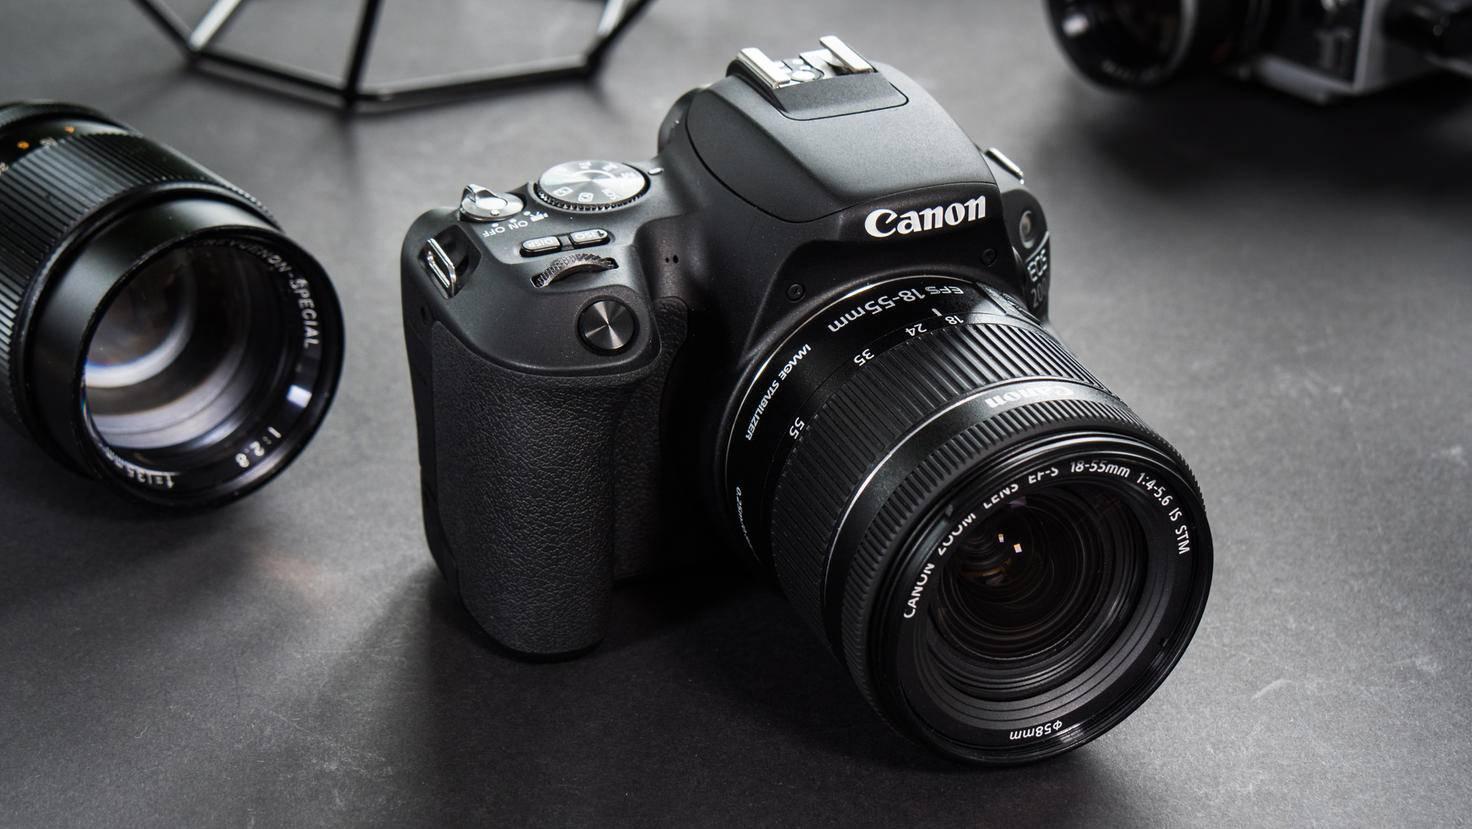 170804_CanonEOS200D-13